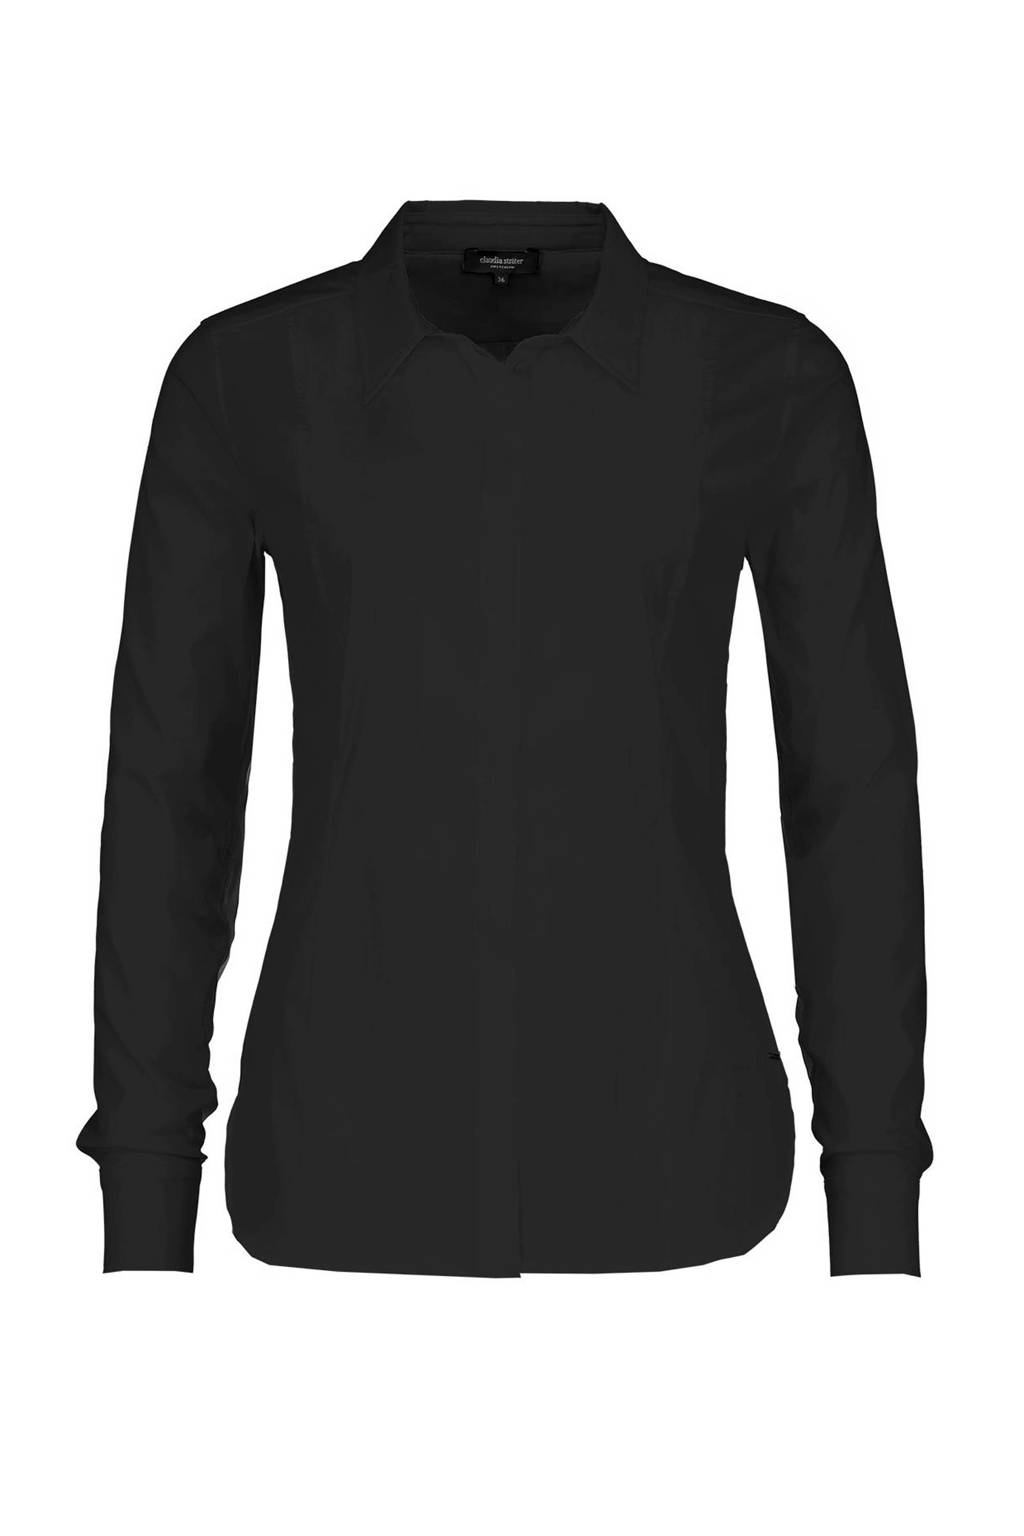 Claudia Sträter blouse, Zwart